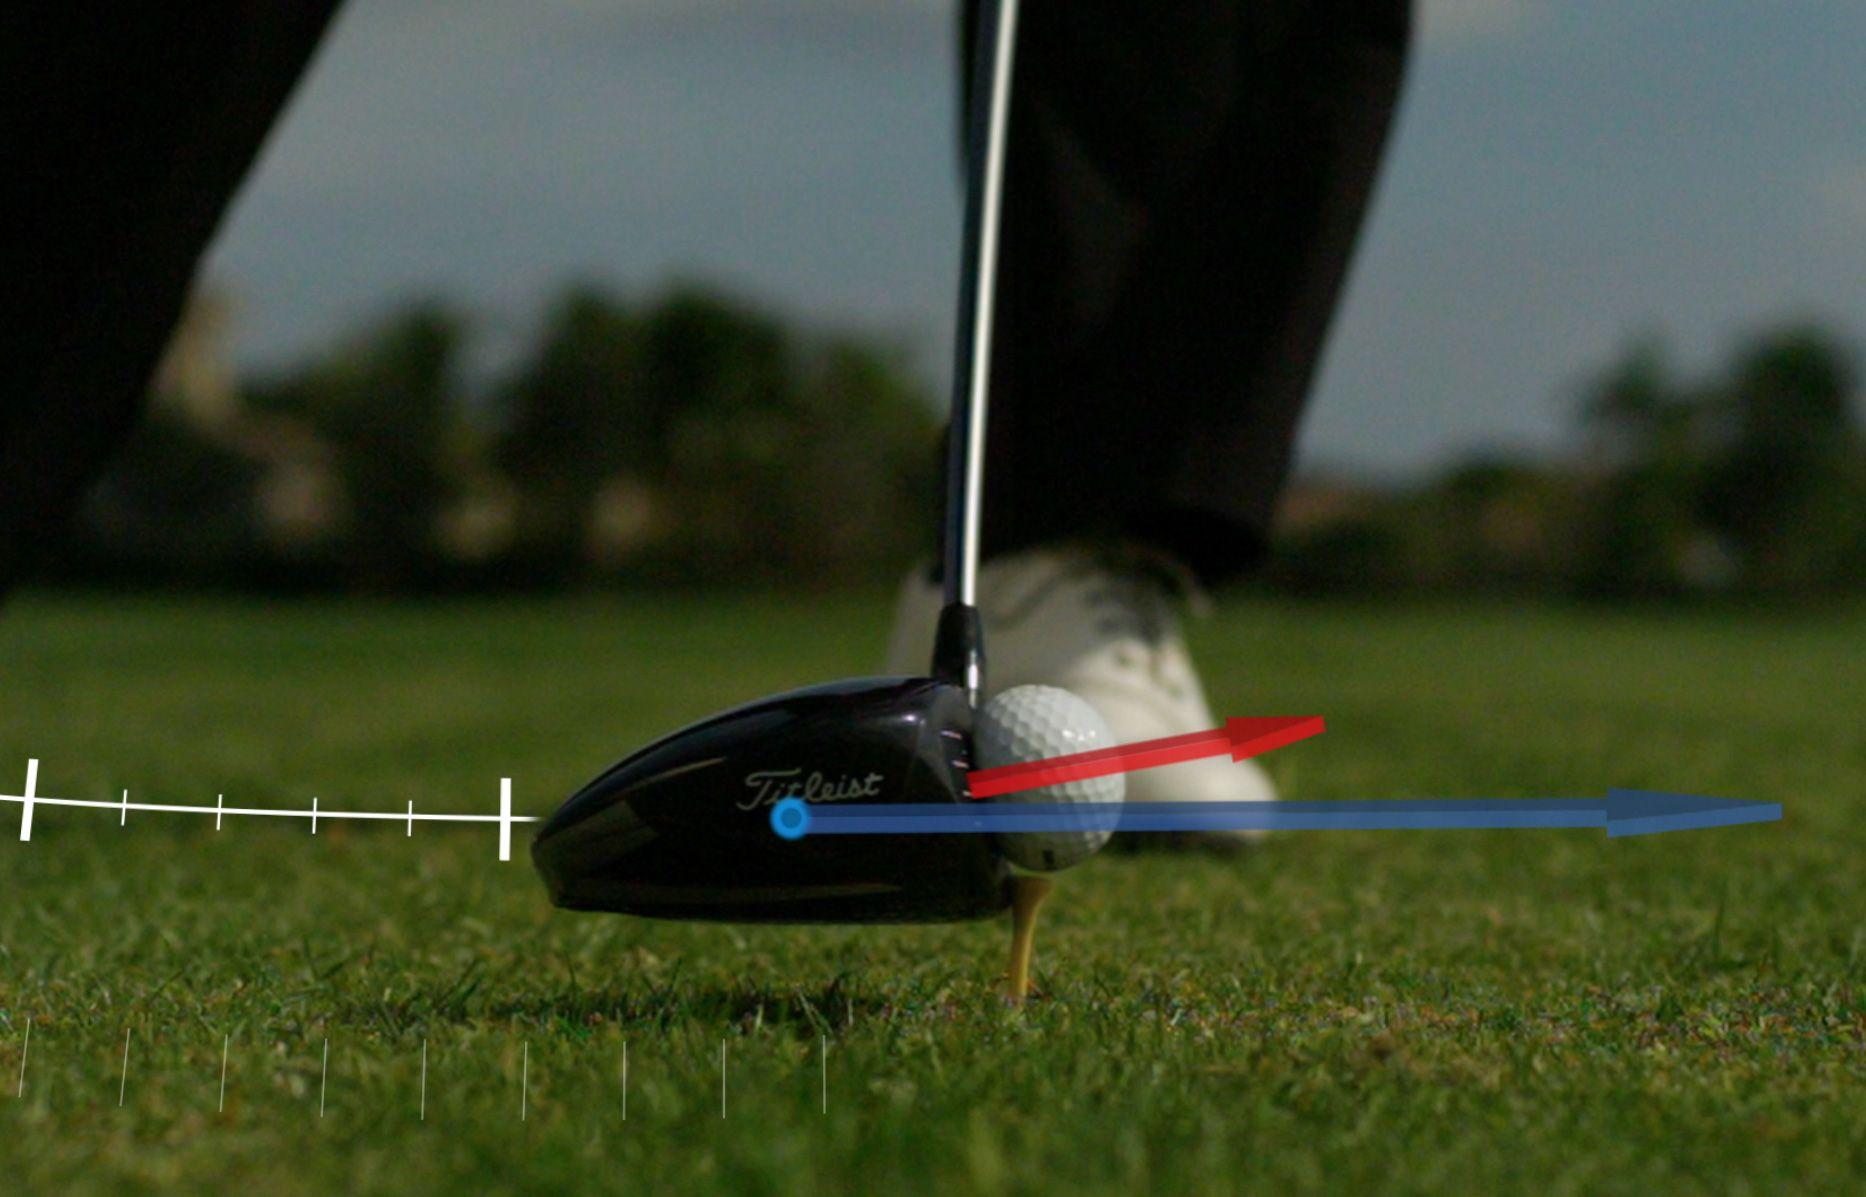 Launch monitor golf radar indoor hd simulator golf